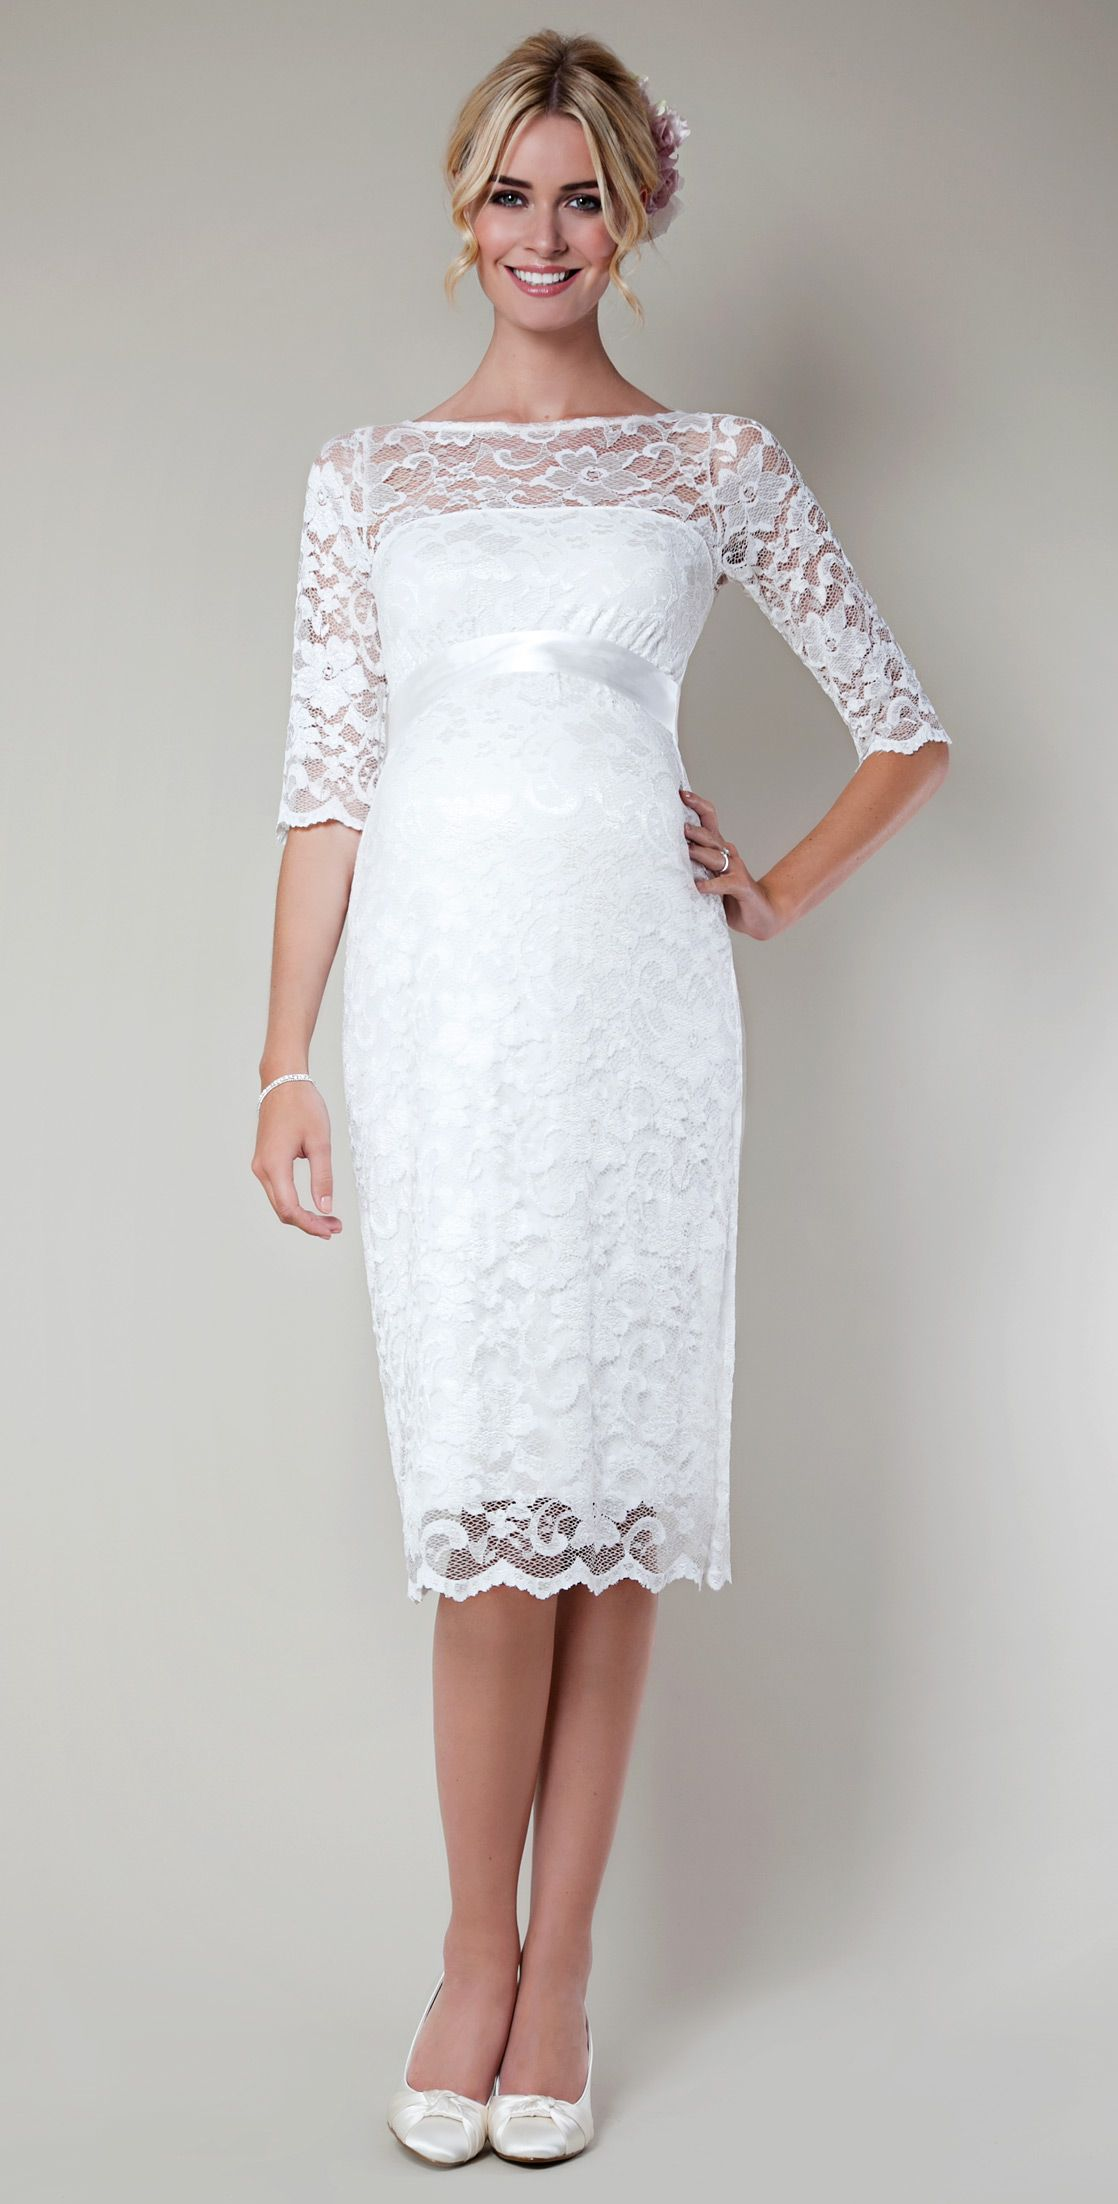 Amelia dress short maternity dresses amelia and tiffany rose amelia dress short ombrellifo Gallery